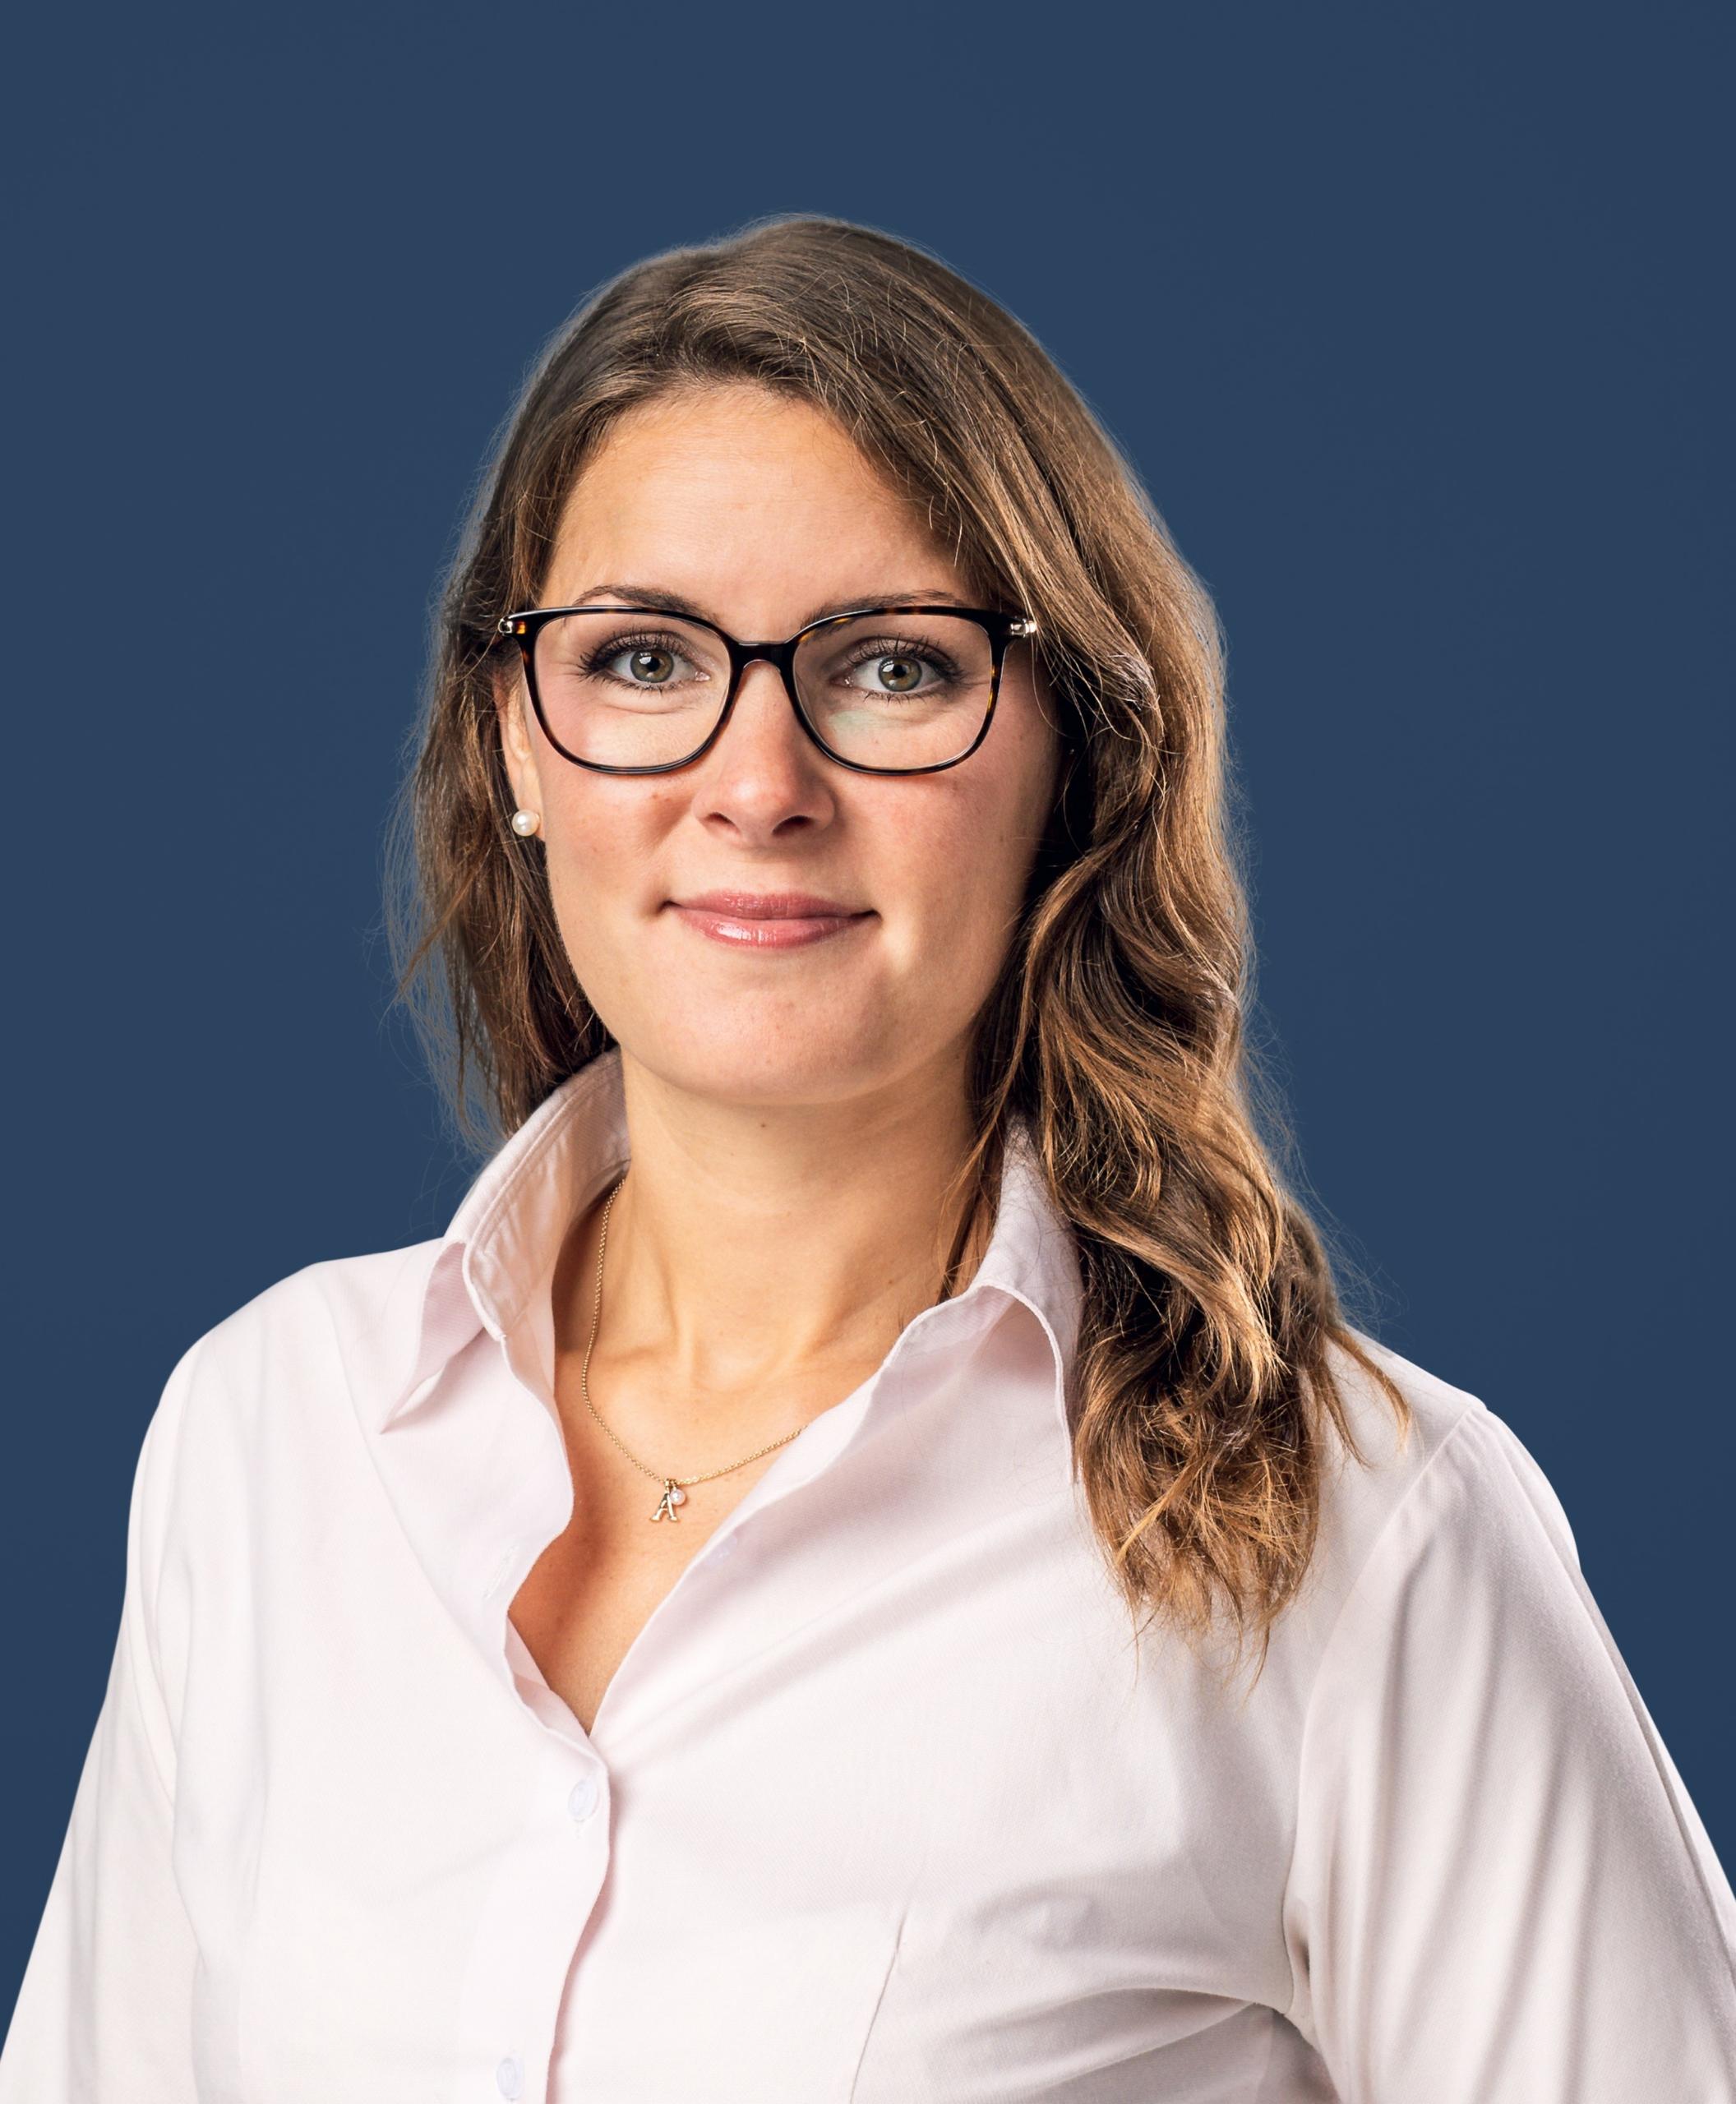 Anna-Lisa Schröter